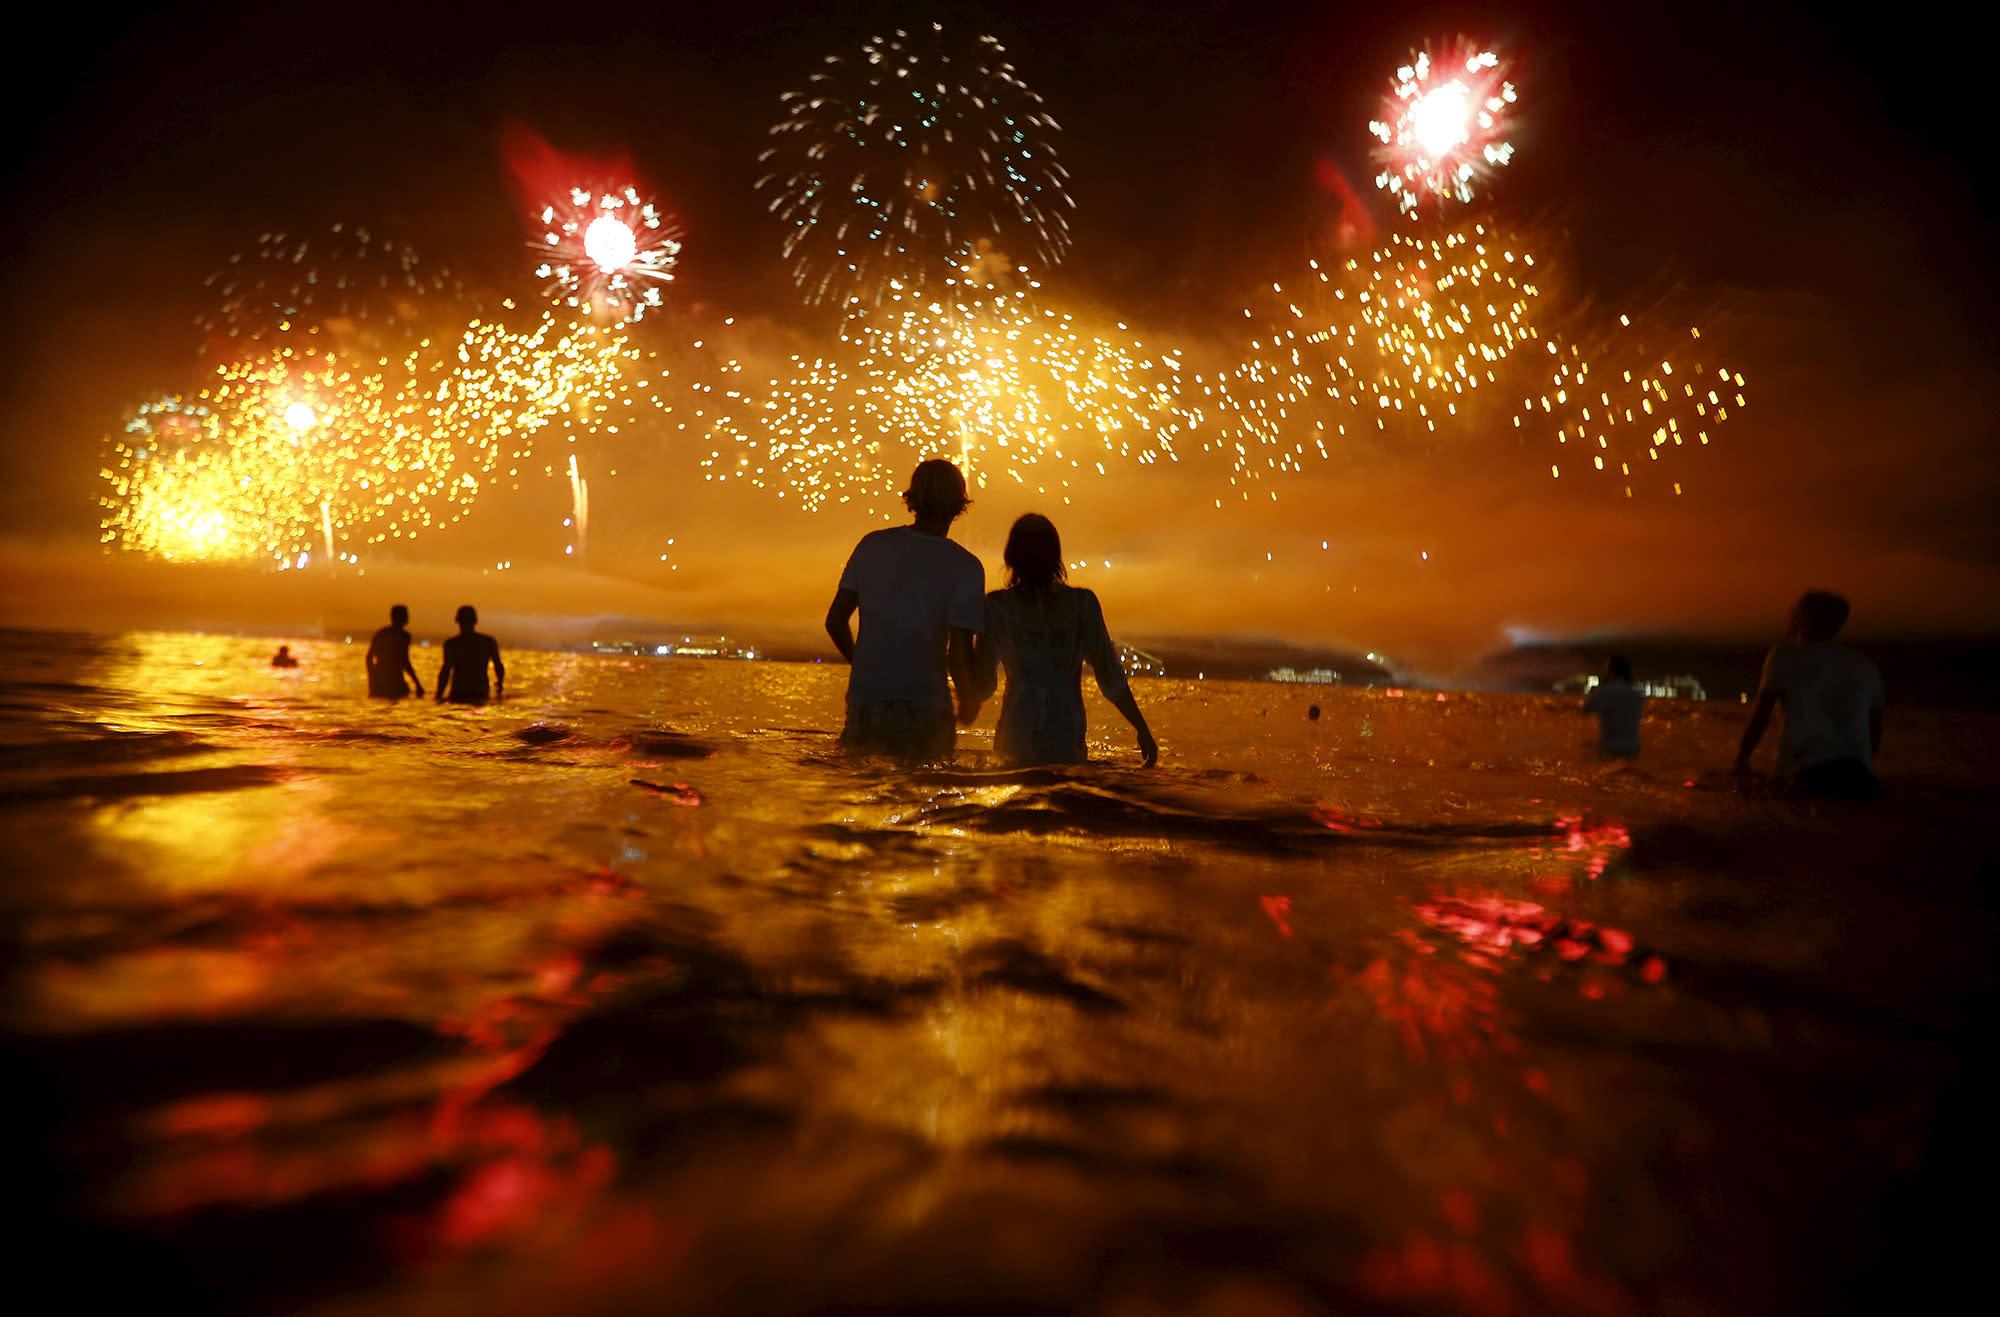 <p>JAN. 1, 2016 — People watch as fireworks explode over Copacabana beach during New Year celebrations in Rio de Janeiro, Brazil. (Ricardo Moraes/Reuters) </p>